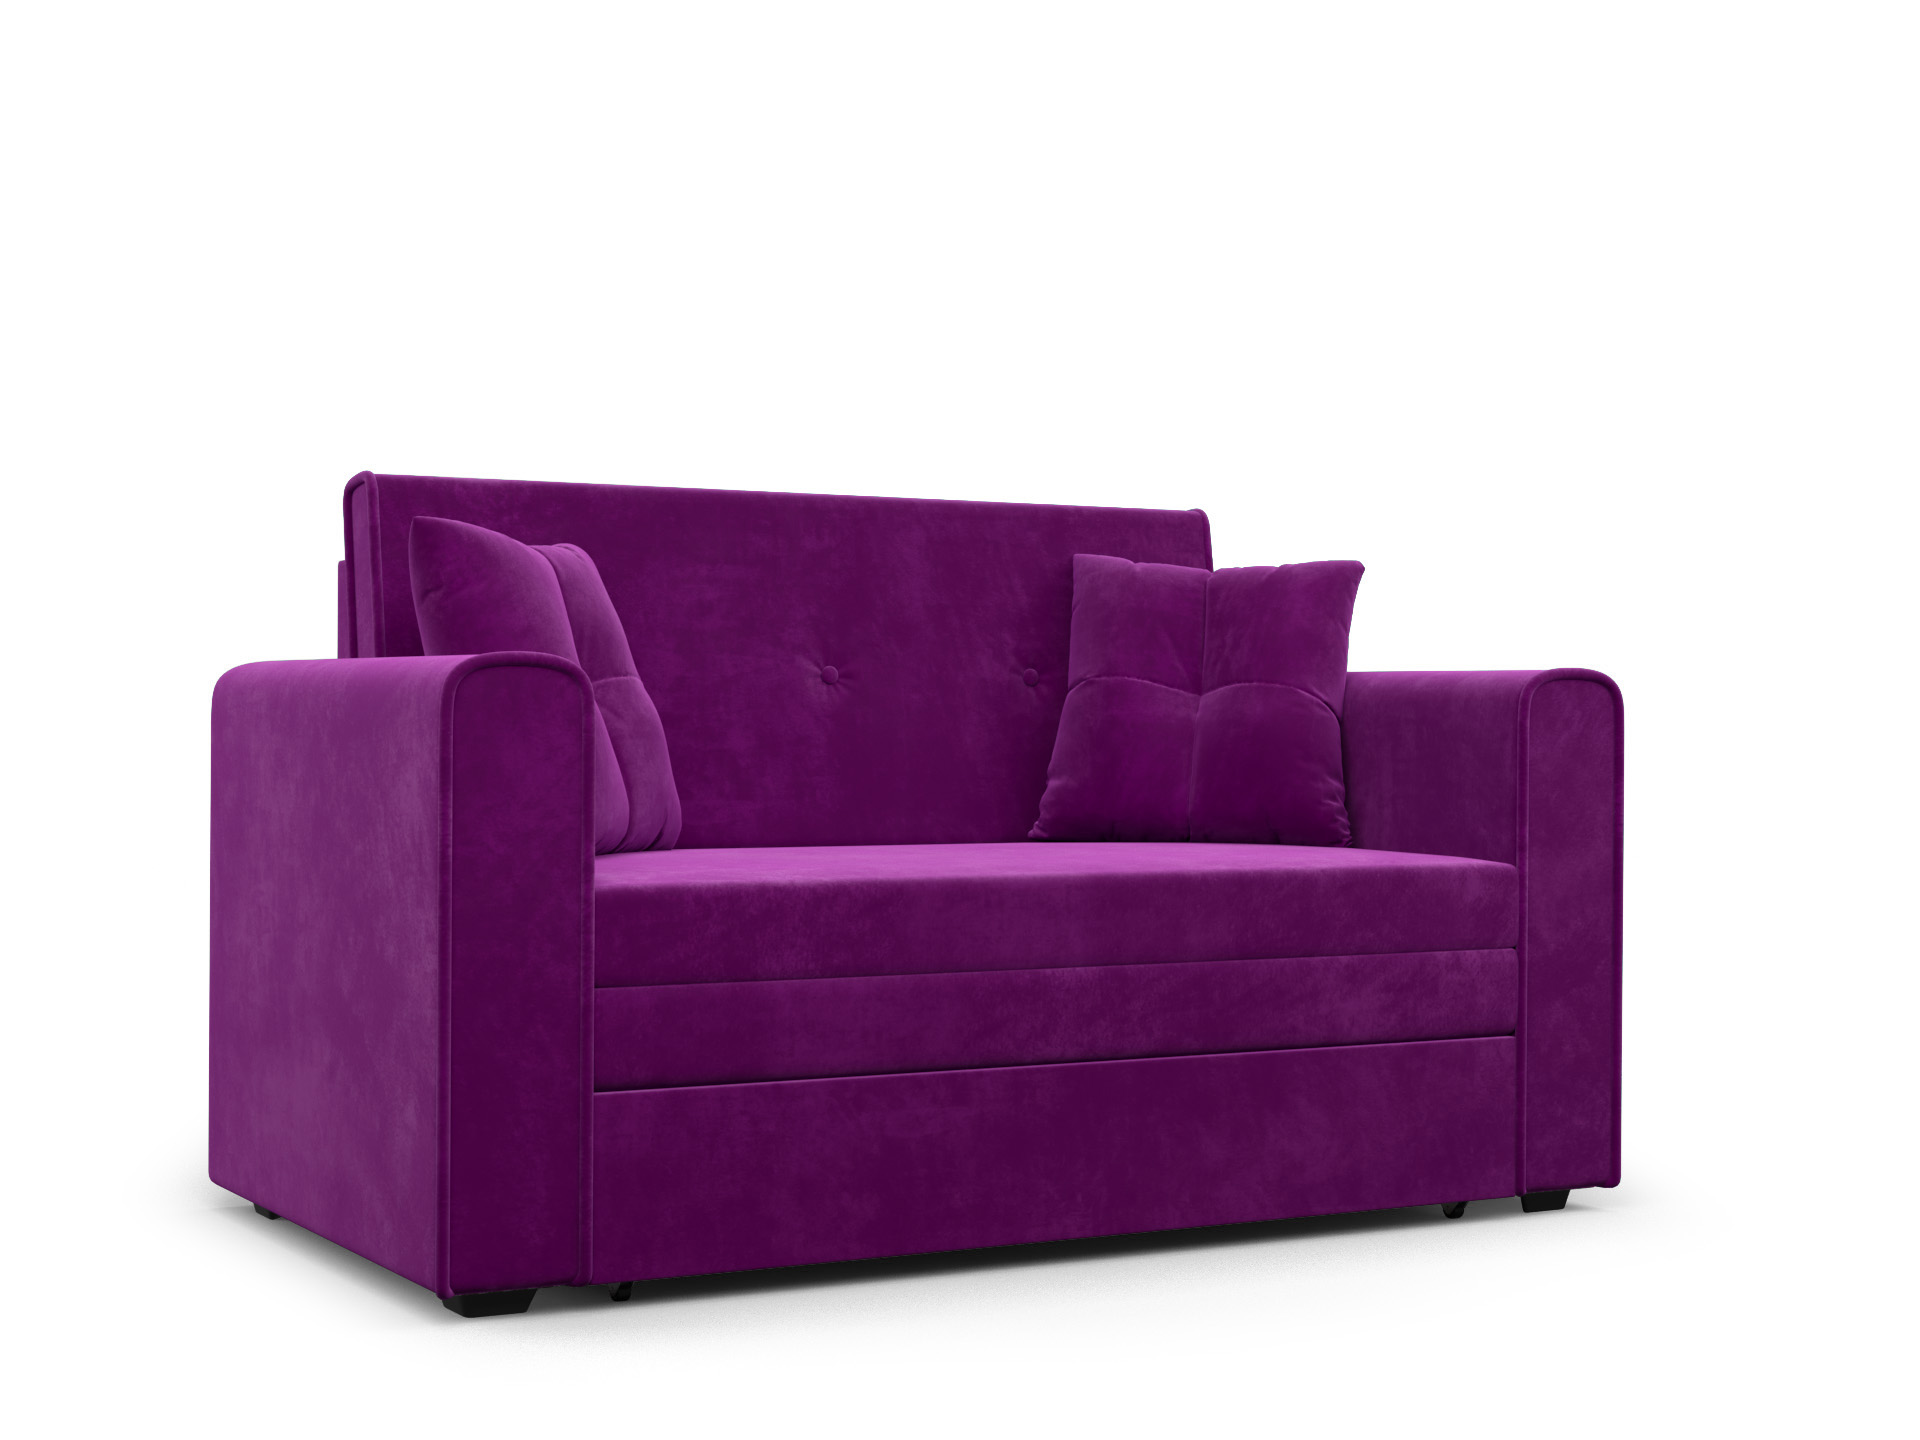 Диван Санта MebelVia Фиолетовый